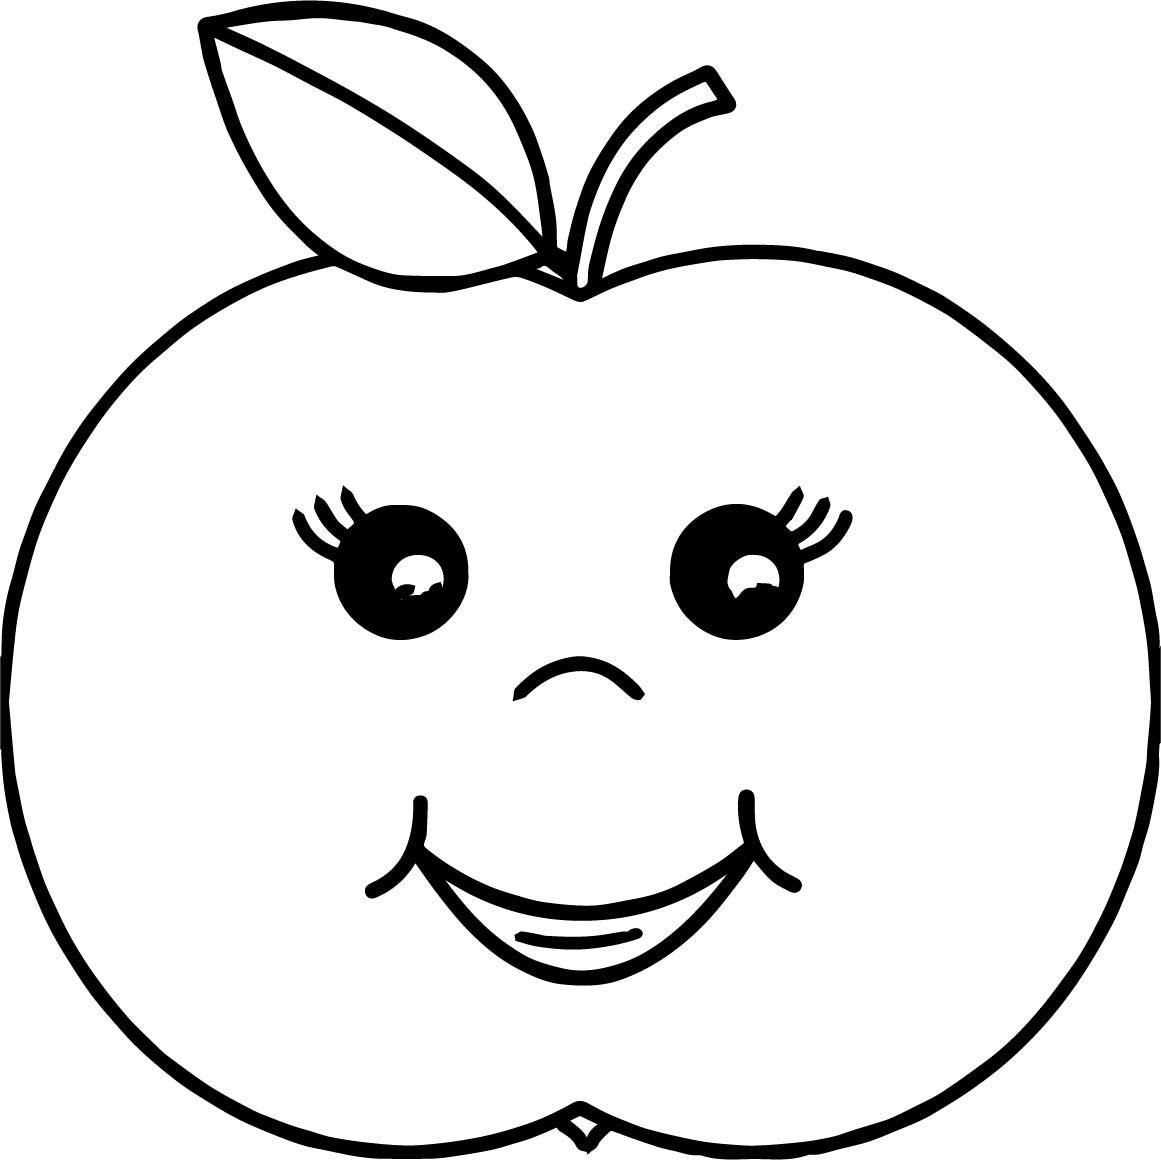 Cool Cartoon Girl Apple Coloring Page Cartoon Coloring Pages Apple Coloring Apple Coloring Pages